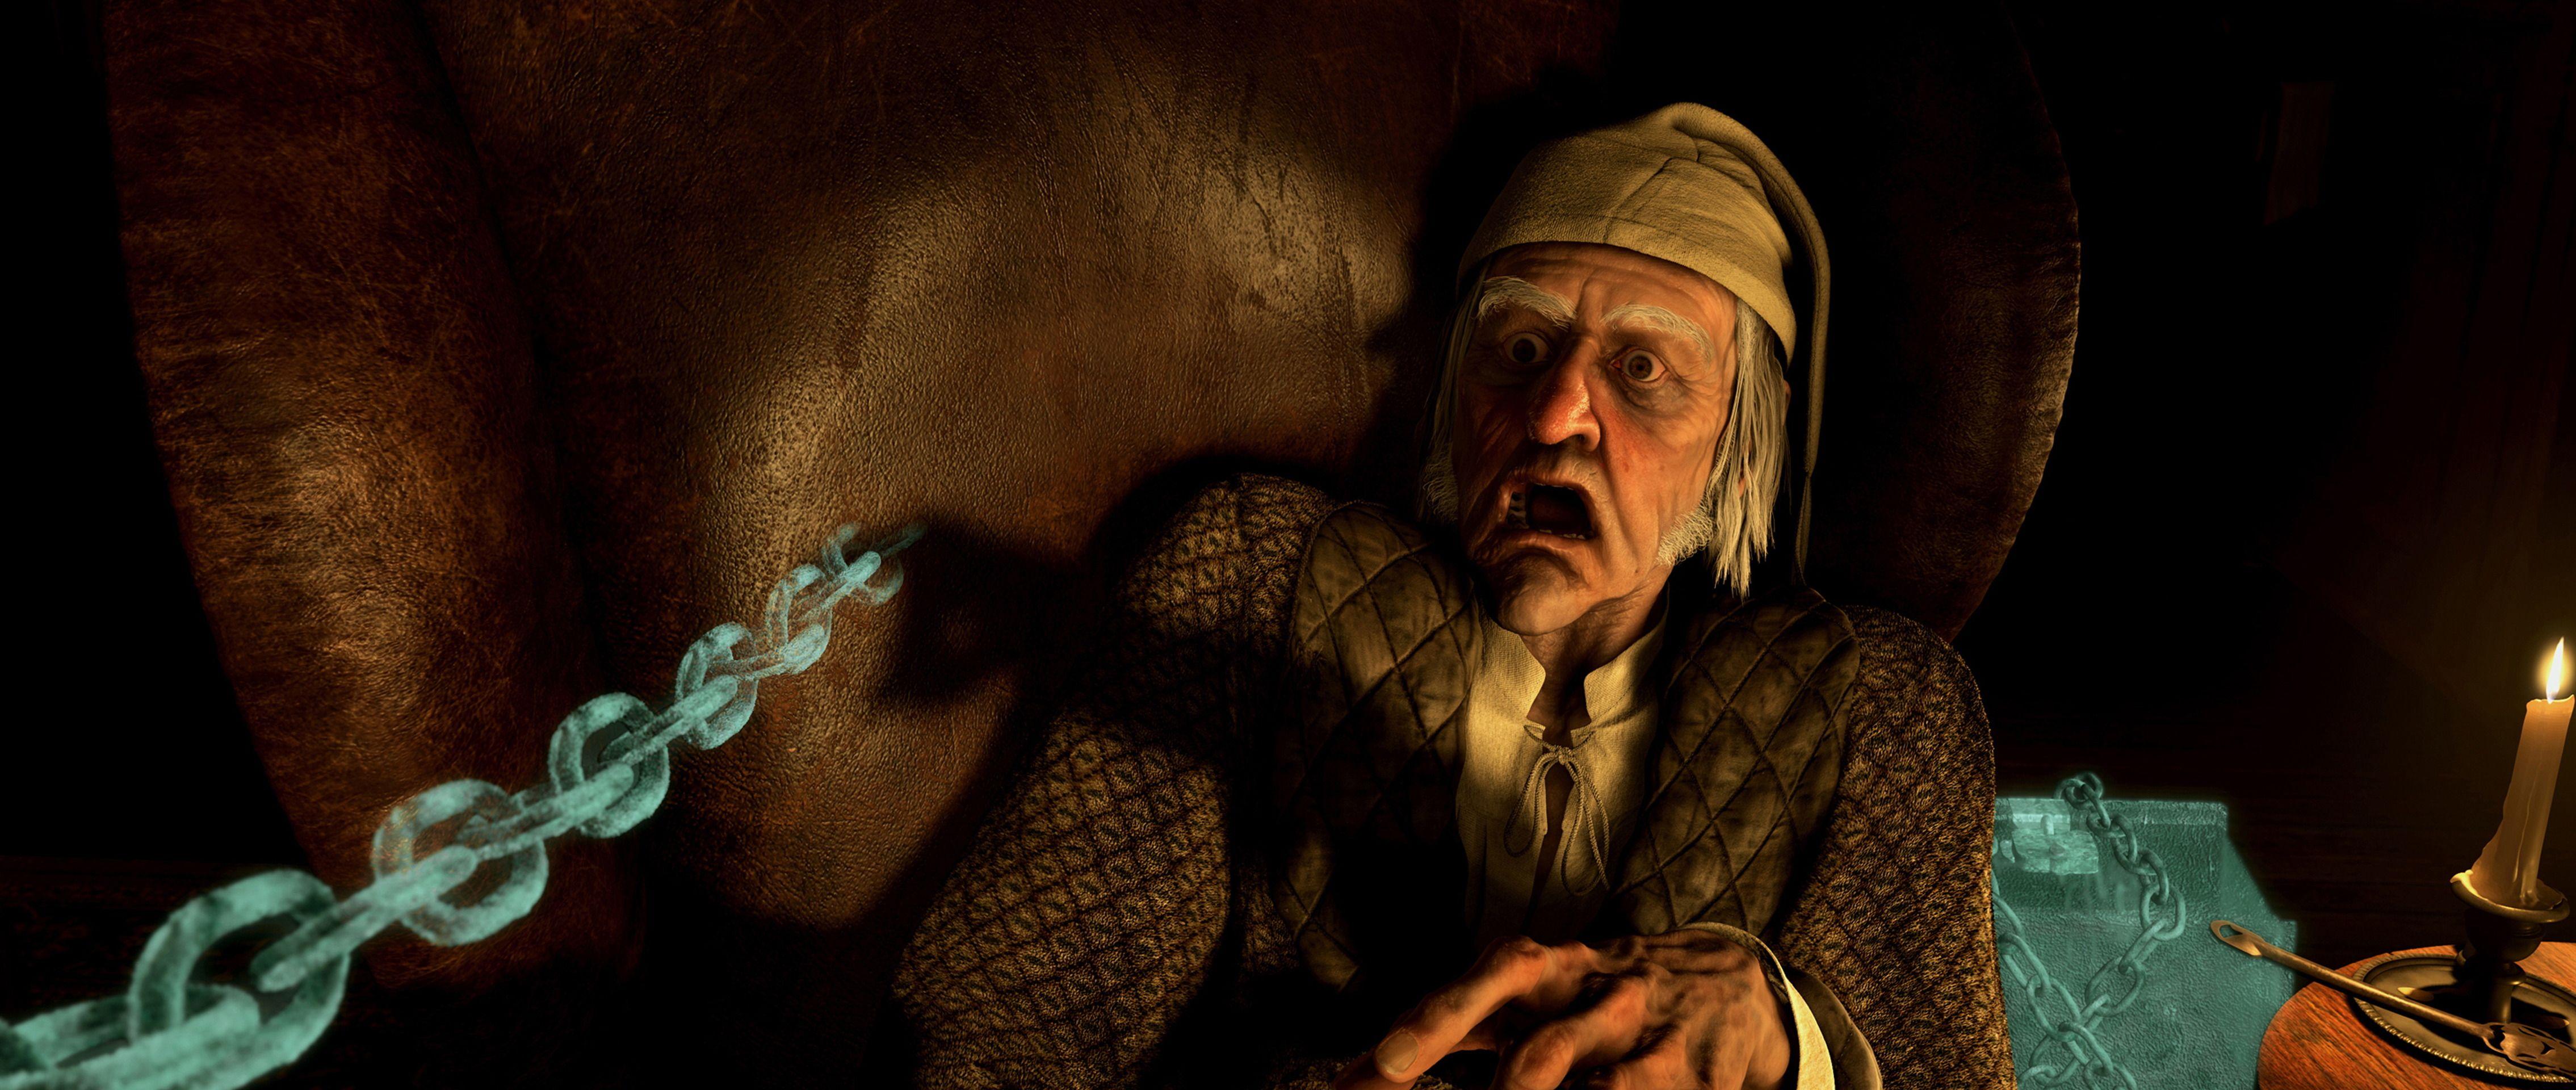 """A Christmas Carol"" movie still, 2009. Jim Carrey as Ebenezer Scrooge. | Christmas carol, Carole ..."